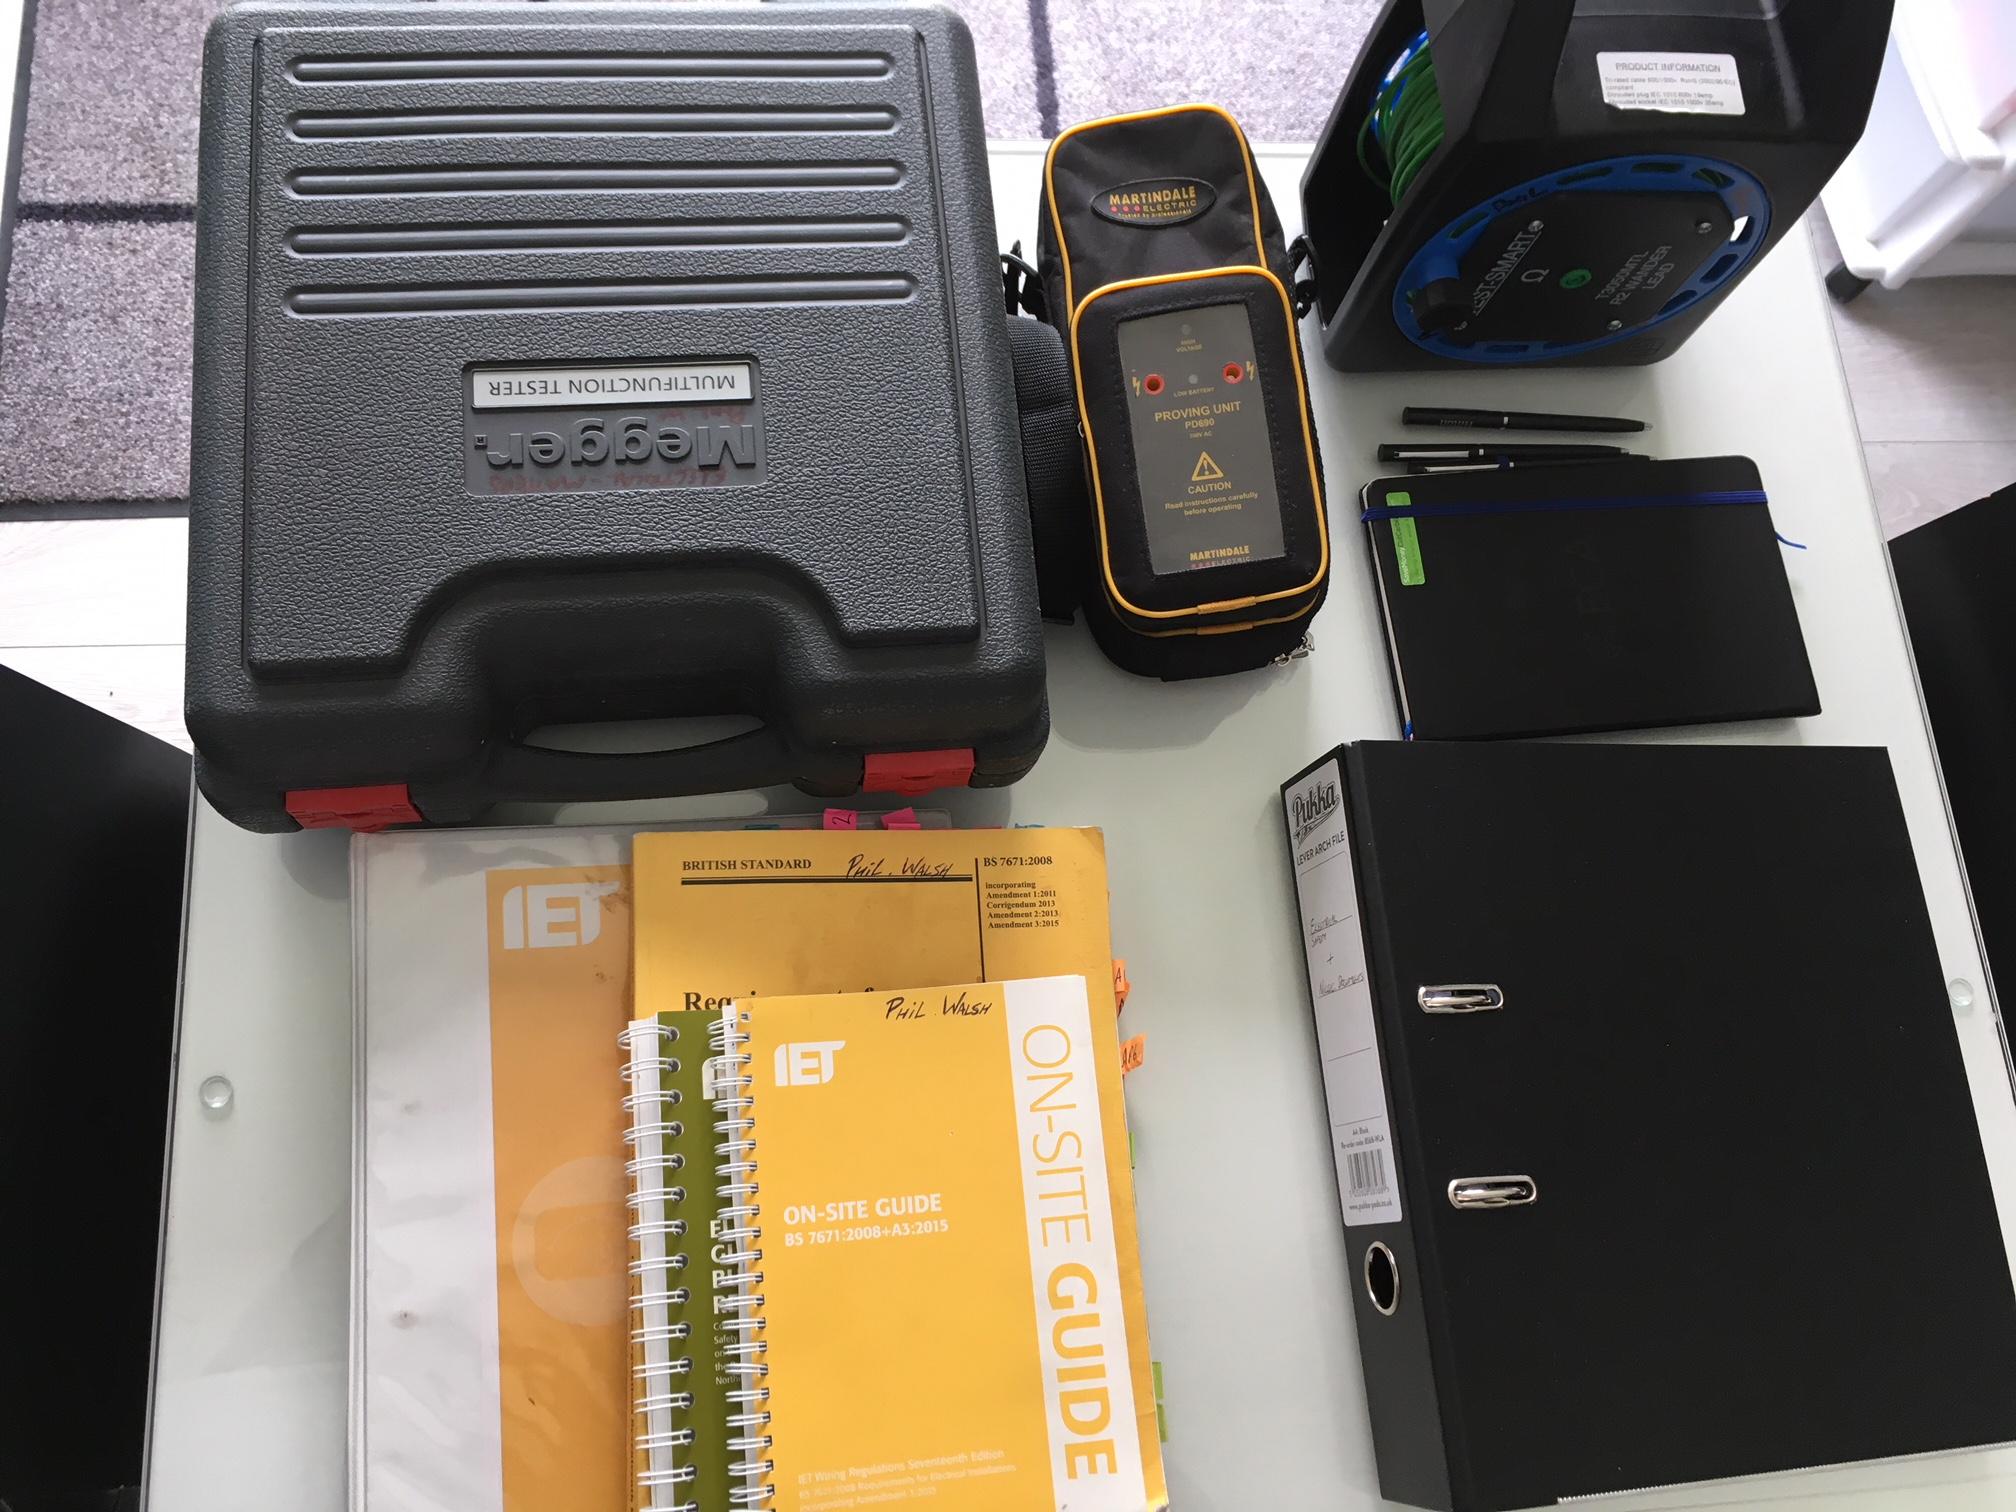 Equipment and docs